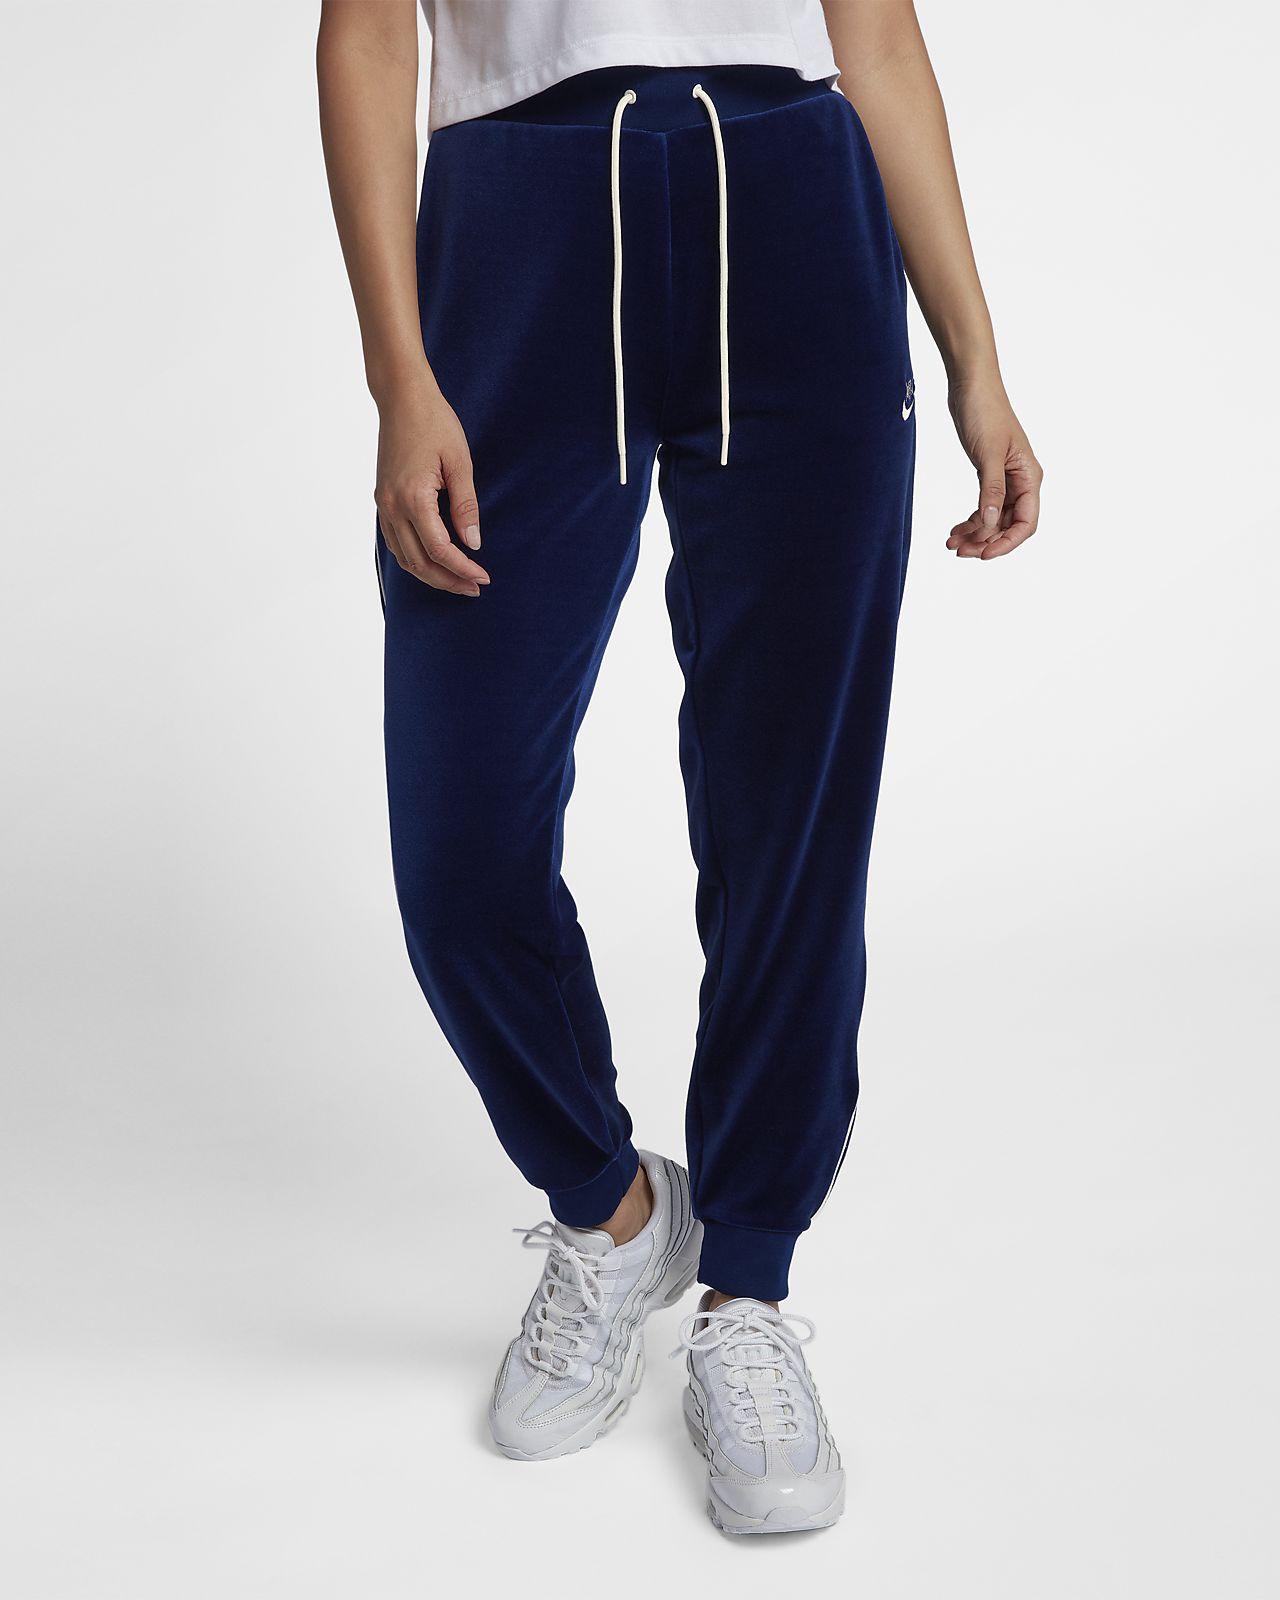 Tracksuits Nike - always stylish and practical